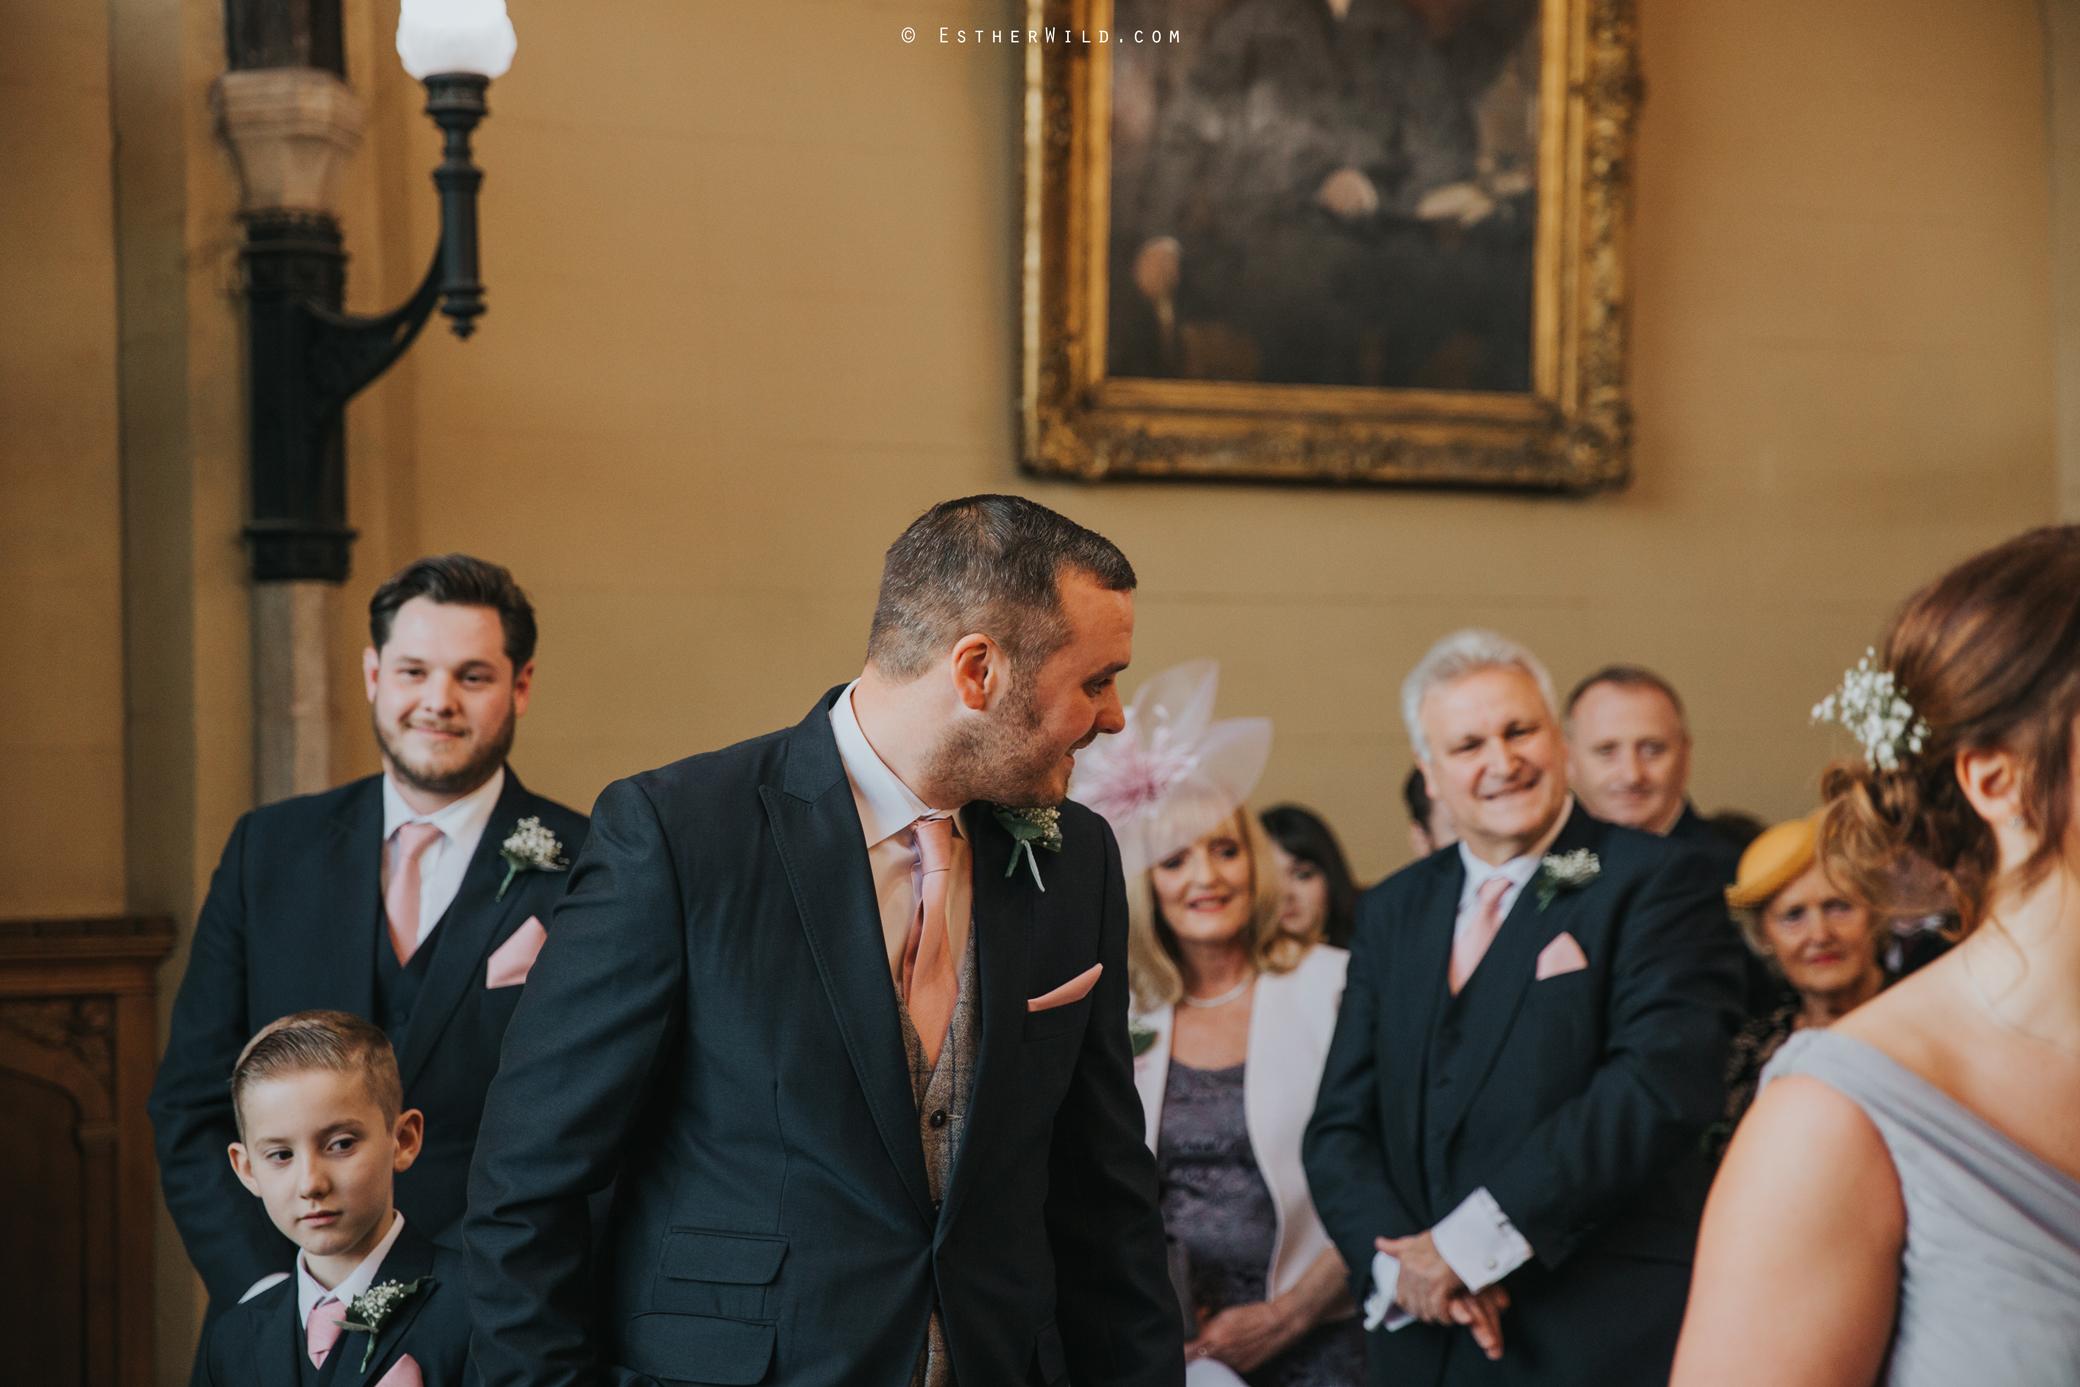 Wedding_Kings_Lynn_Town_Hall_Norfolk_Photographer_Esther_Wild_IMG_0925.jpg